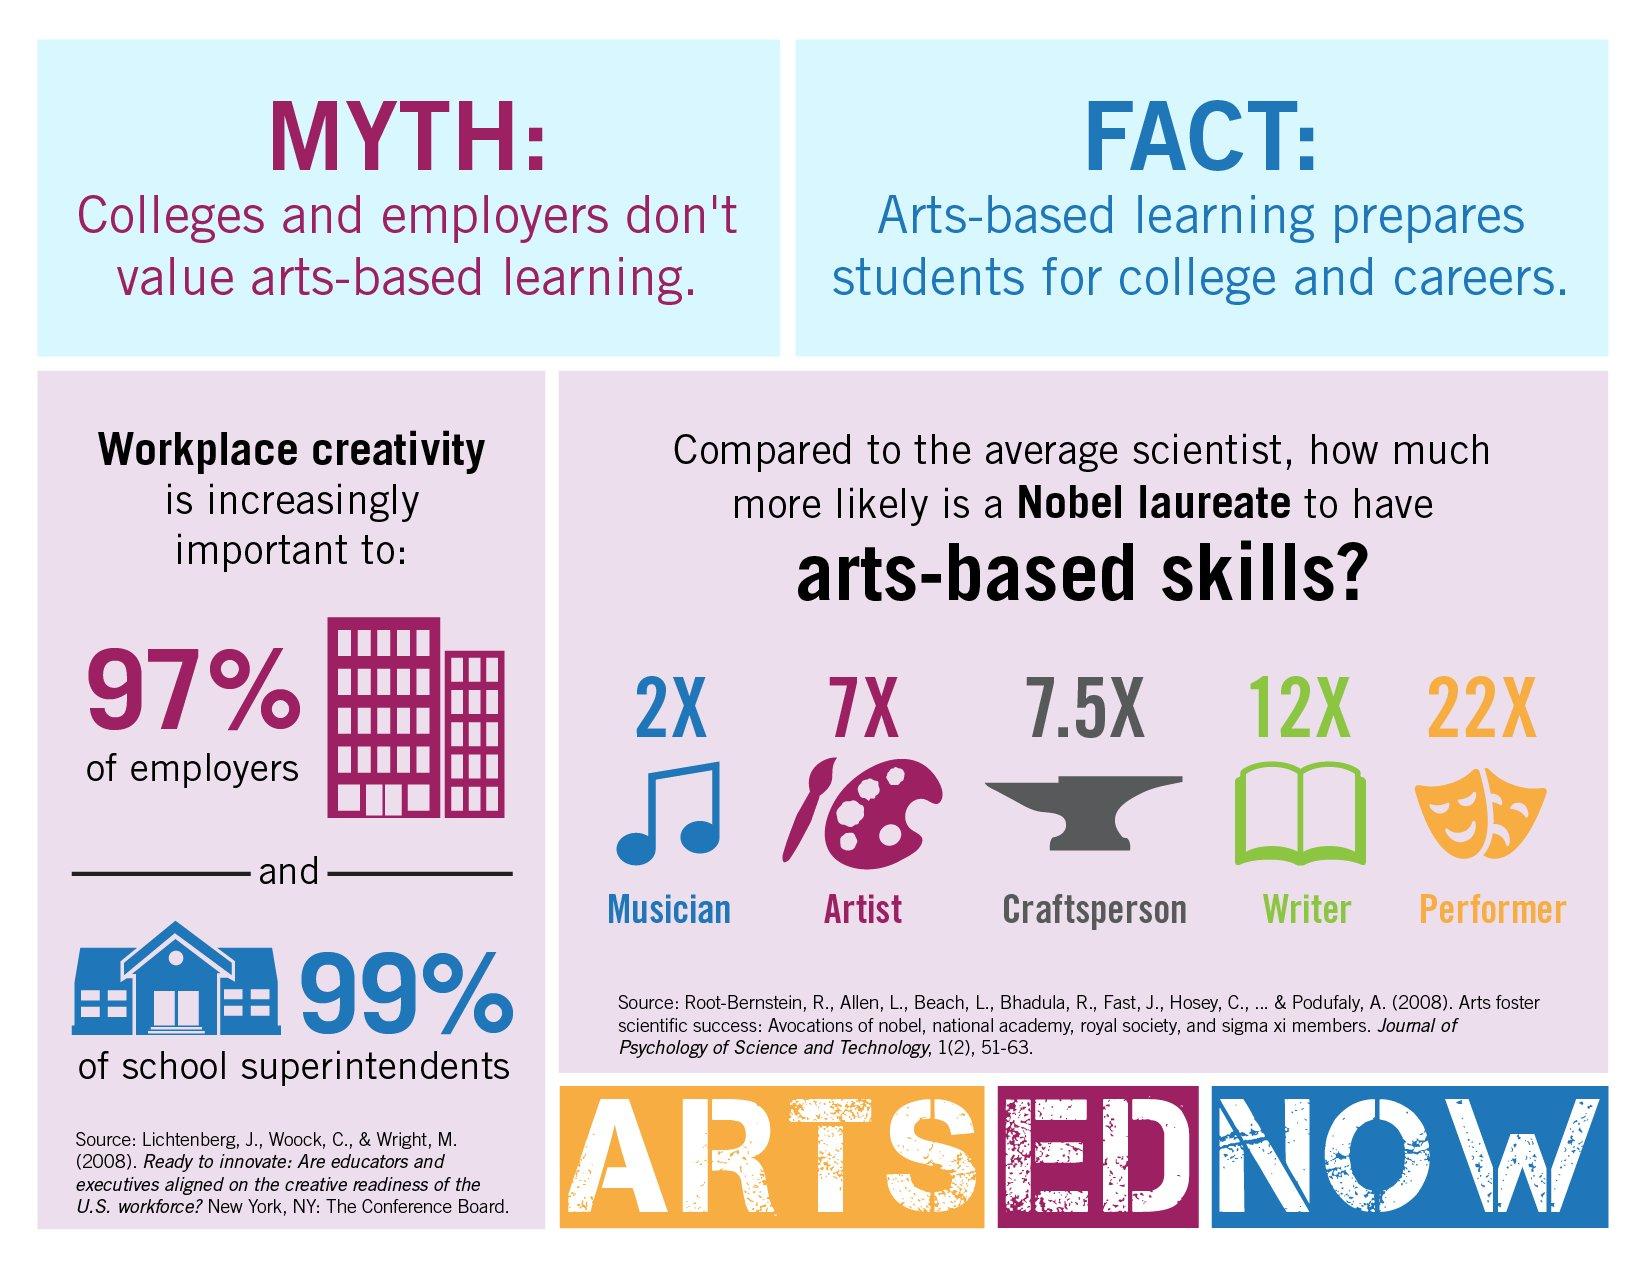 #ArtsEdNow #Facts for #ArtsEdWeek! #MythvsFact #DidYouKnow  Arts-based learning prepares students for college and careers!  #ArtsEducation #becauseofArtsEd https://t.co/GcpUtIIqEV